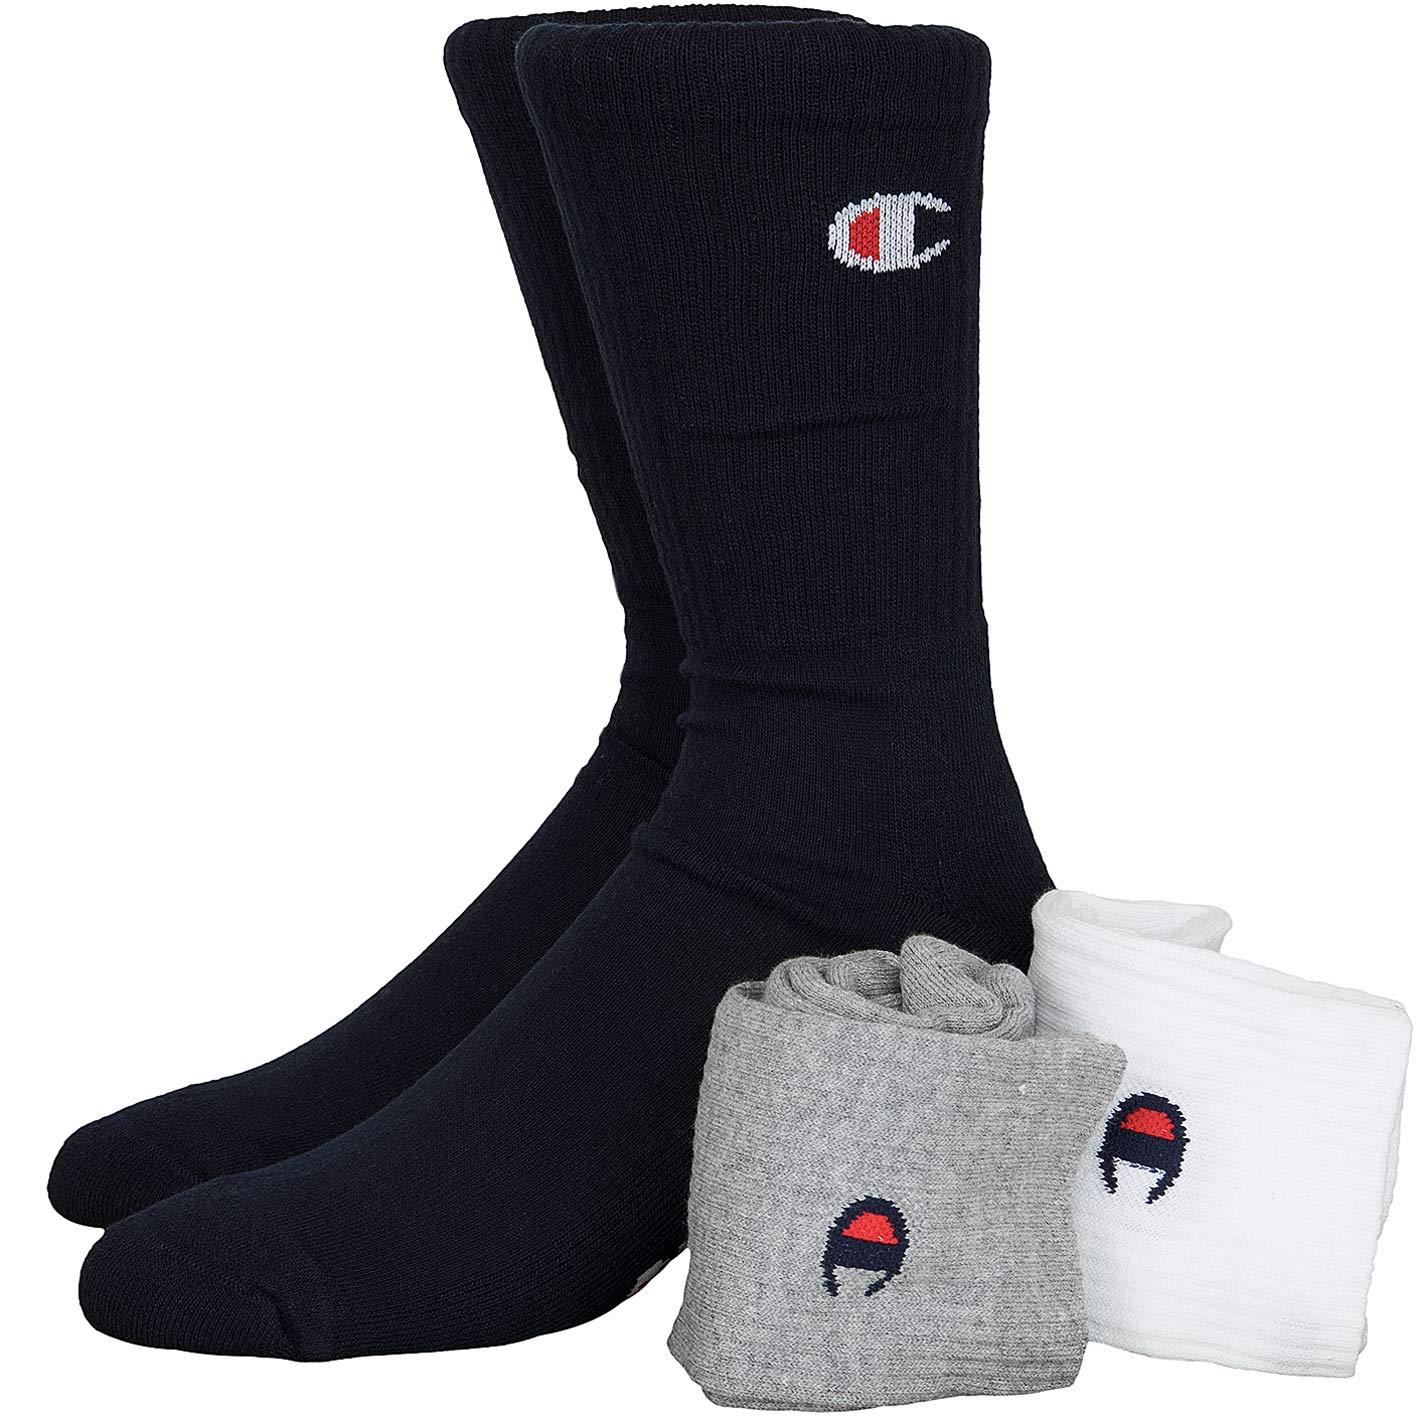 Champion Socken 3er Pack Dunkelblau/grau/weiß